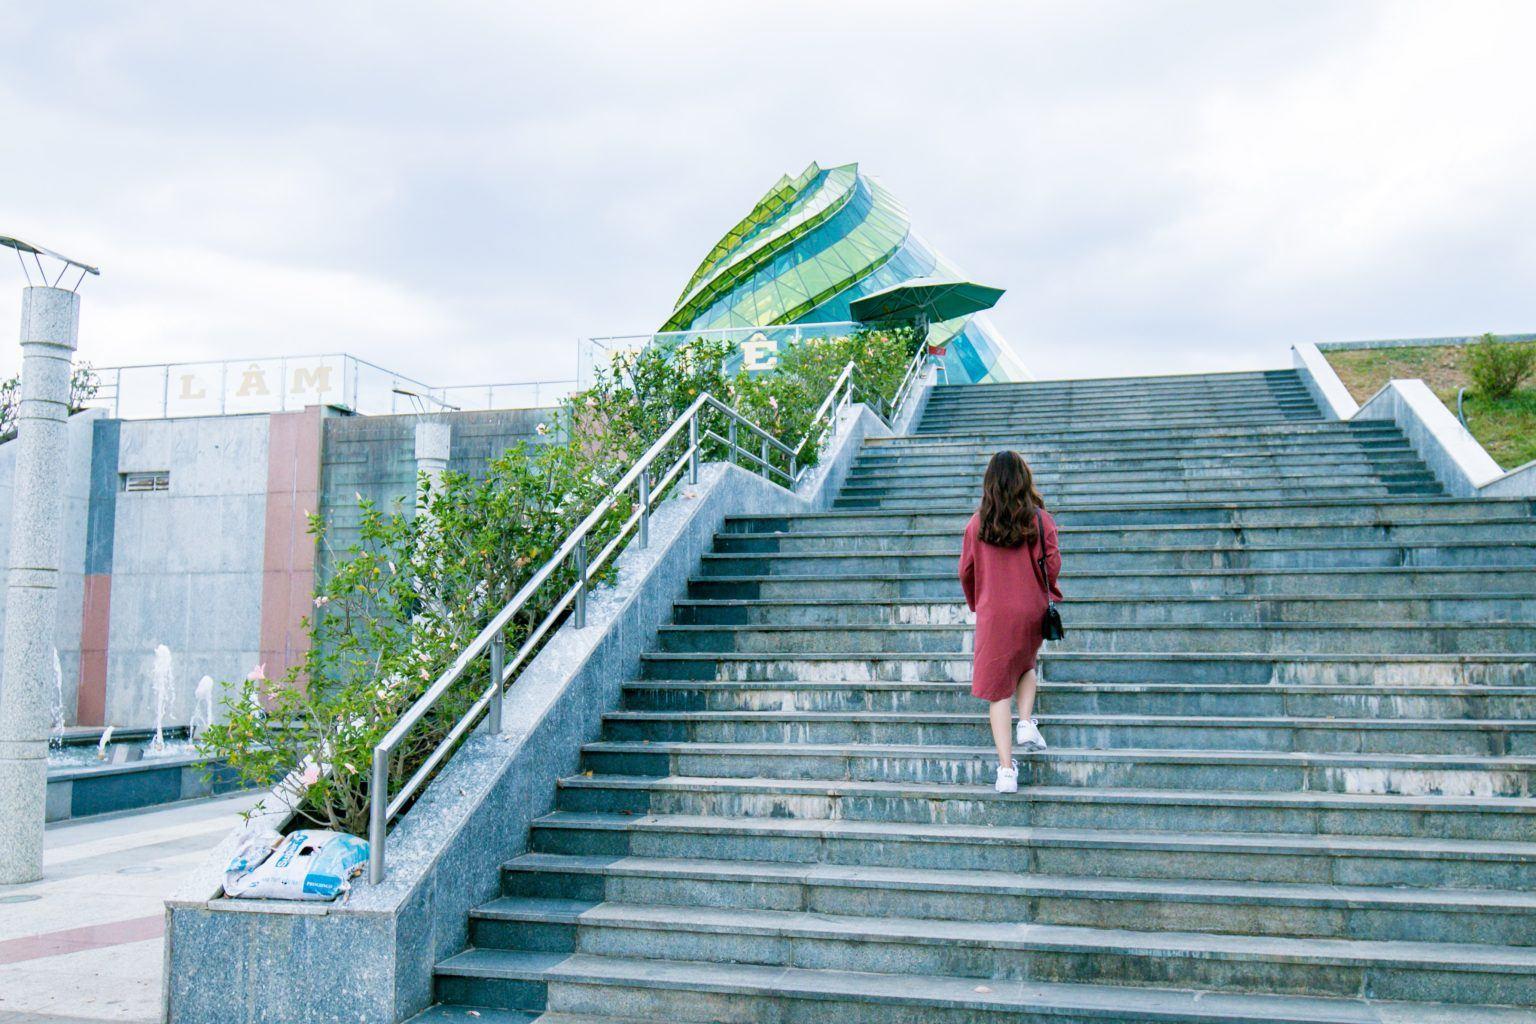 Frau auf Treppen